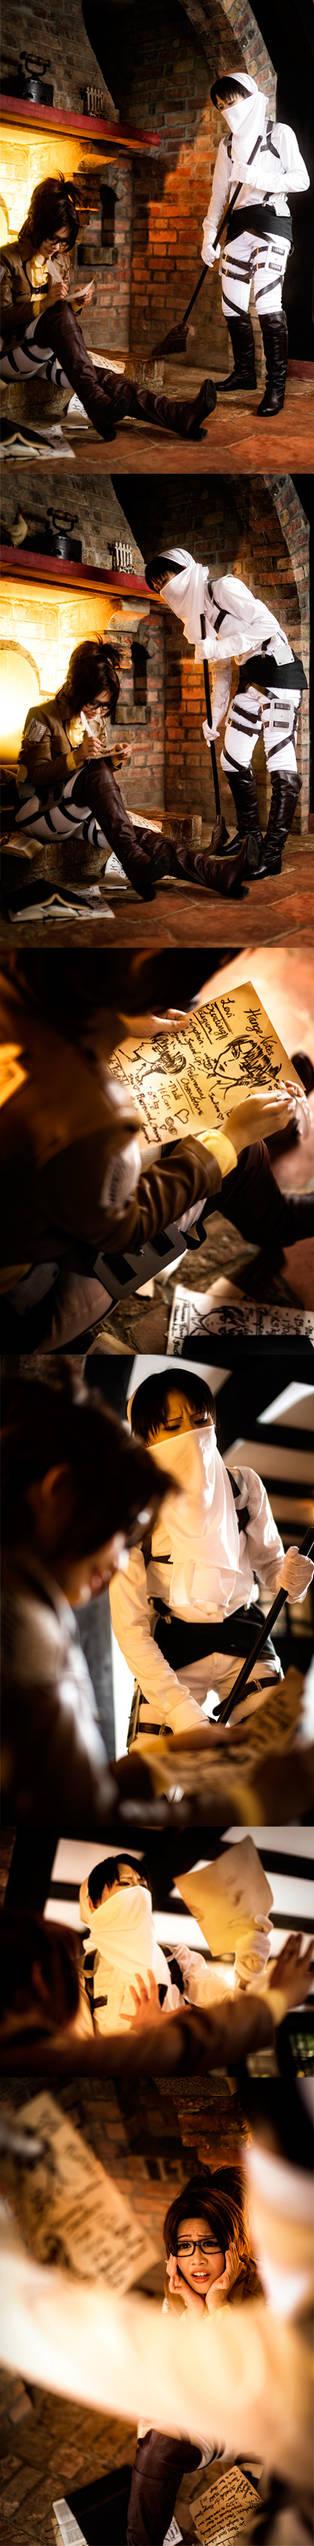 Shingeki no Kyojin: Caught in The Act